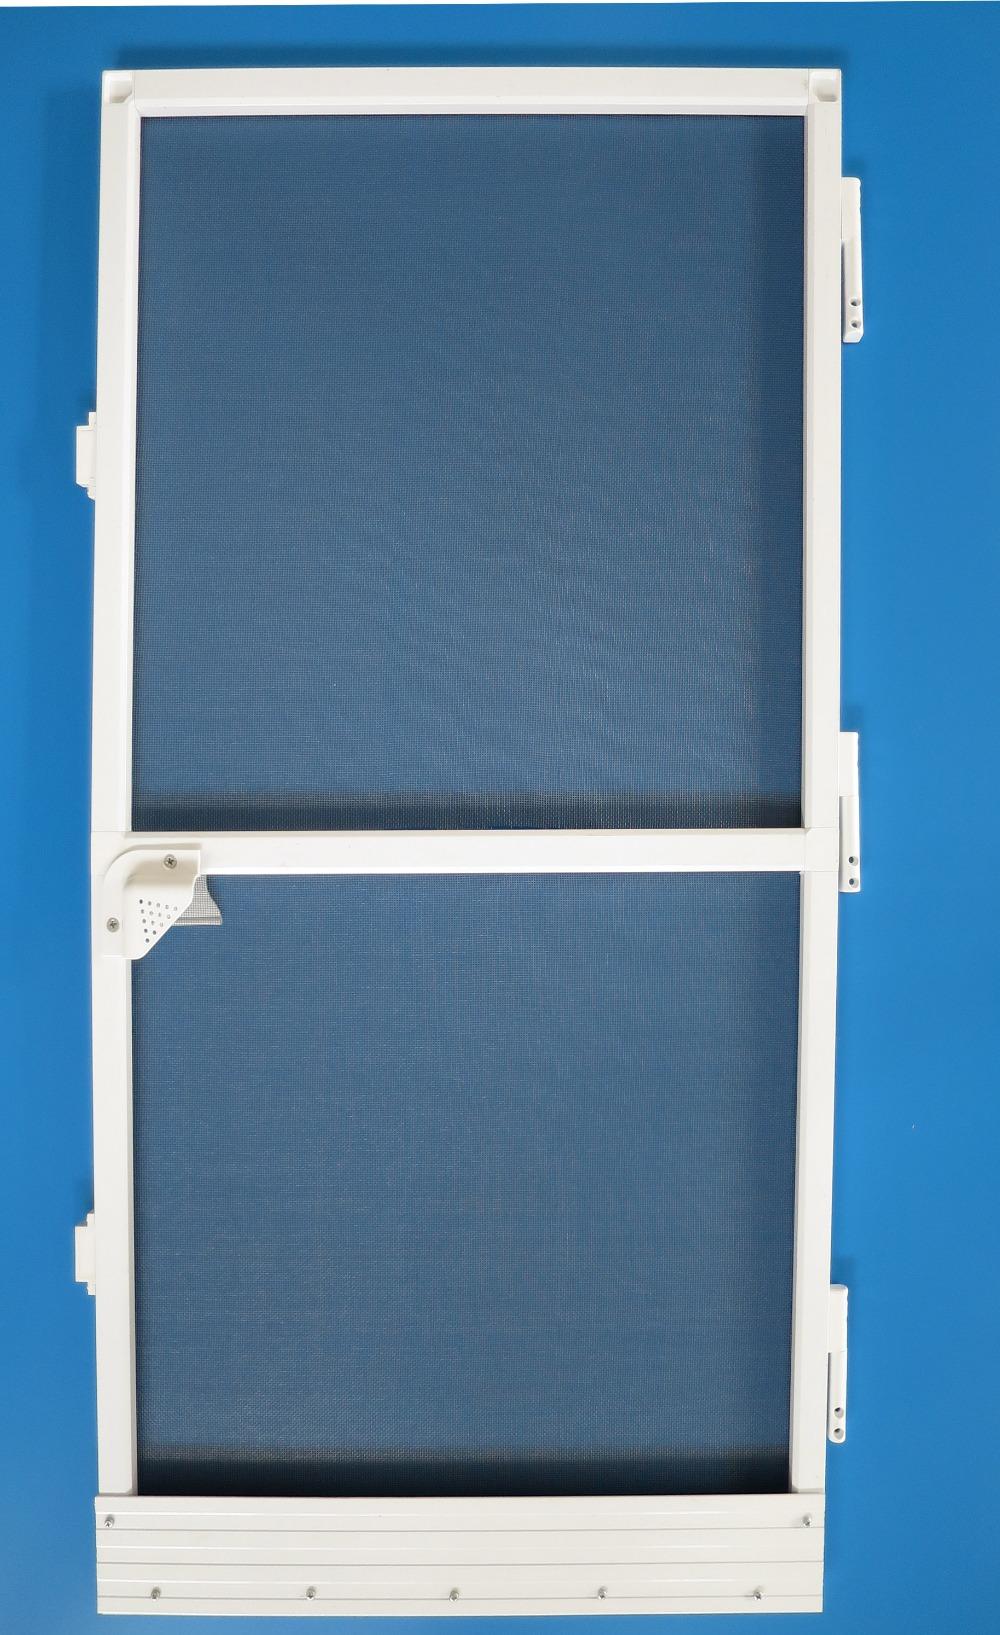 how to cut aluminum screen frame